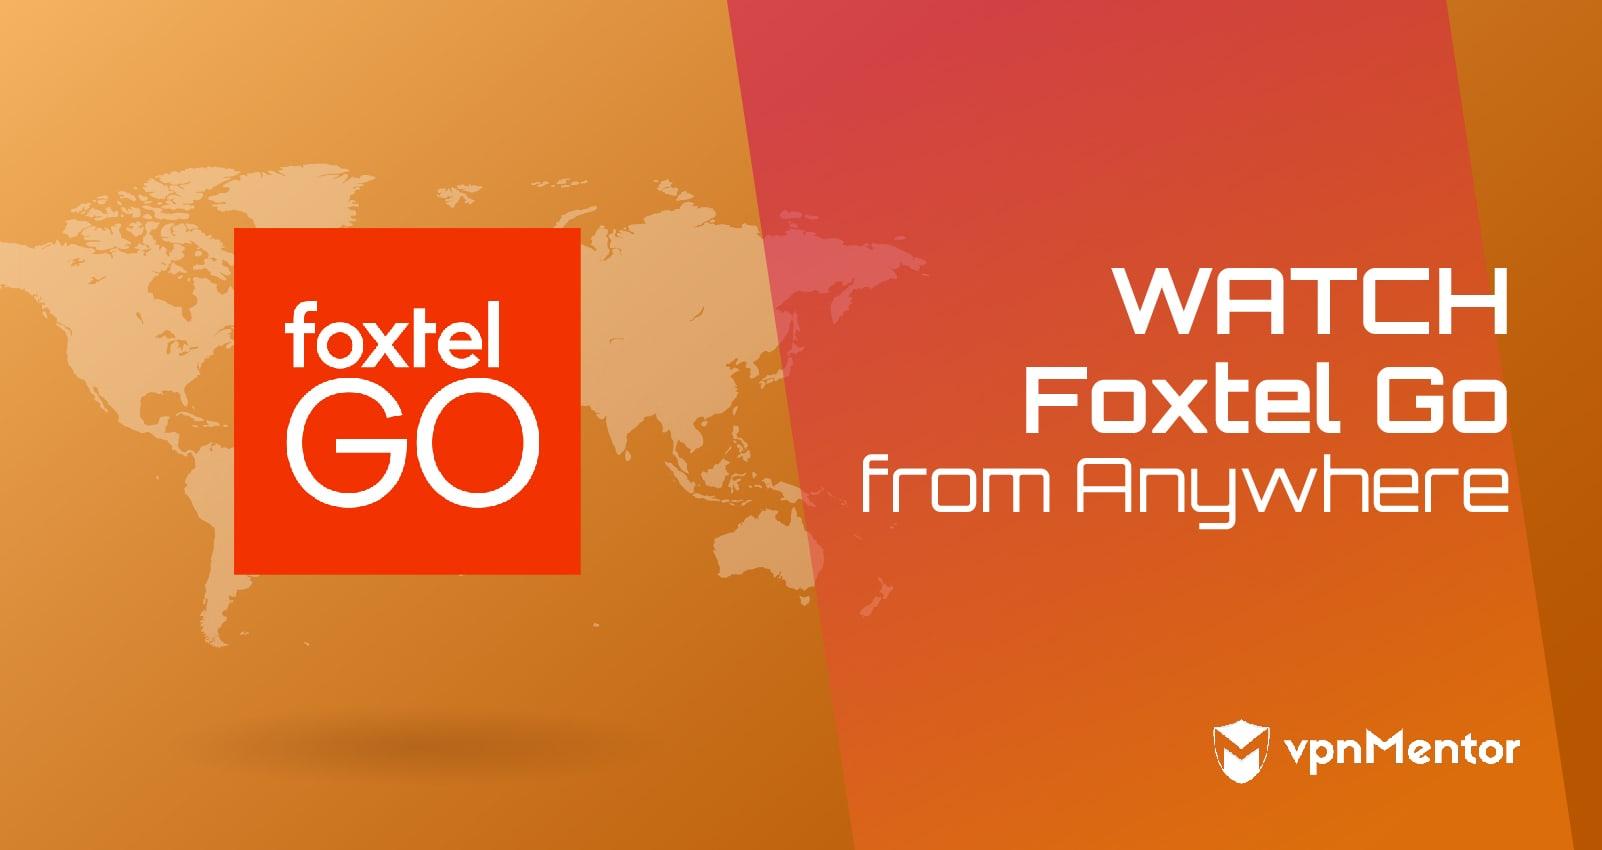 Watch Foxtel Go Anywhere